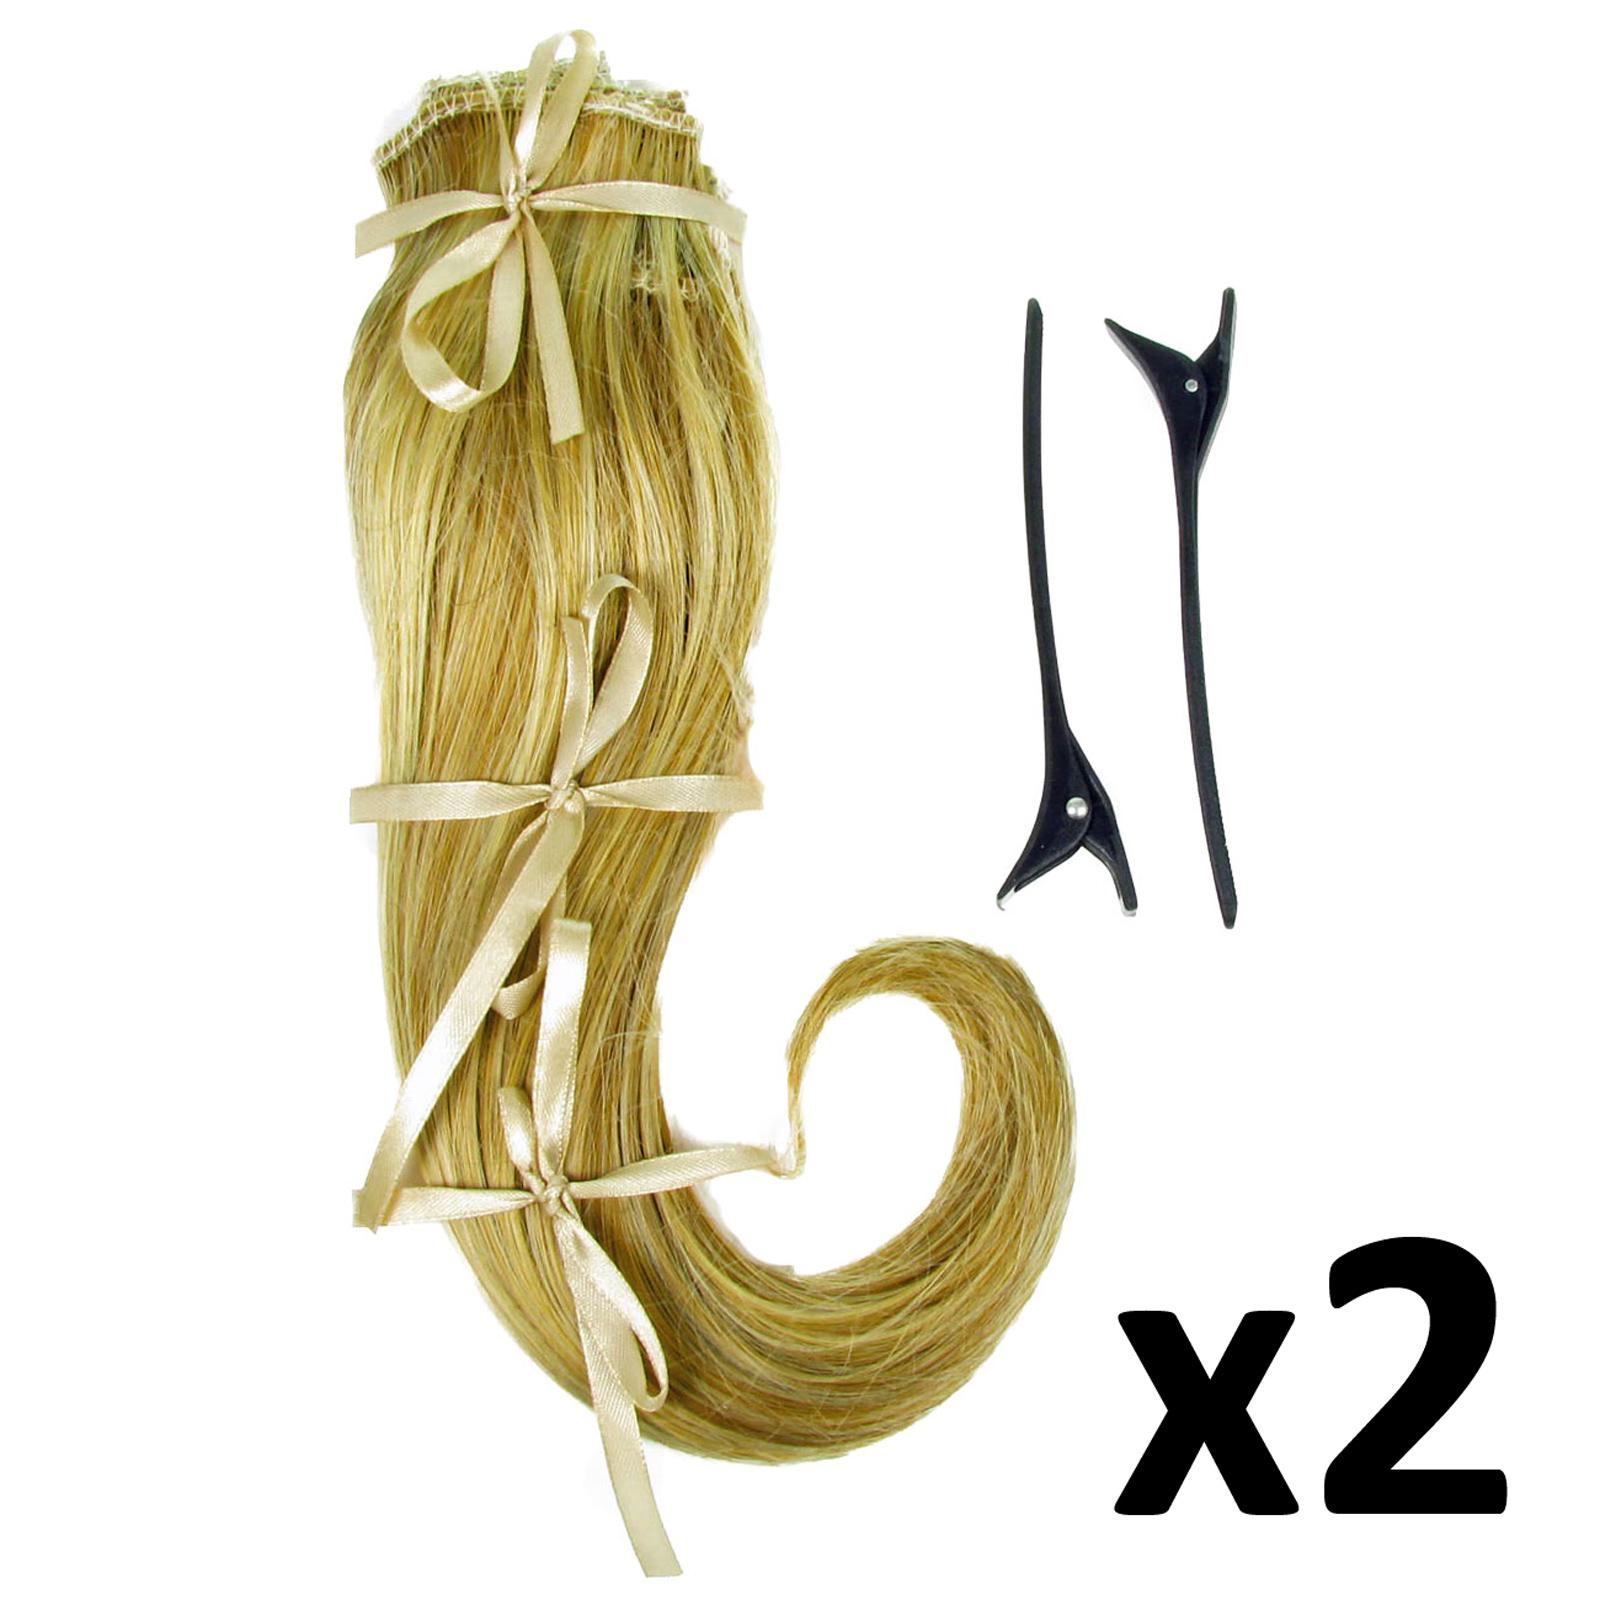 Hair Extensions Clip In 2 Piece Ken Paves Hairdo Ginger Blonde Fashion 16 X2 5055426931129 Ebay